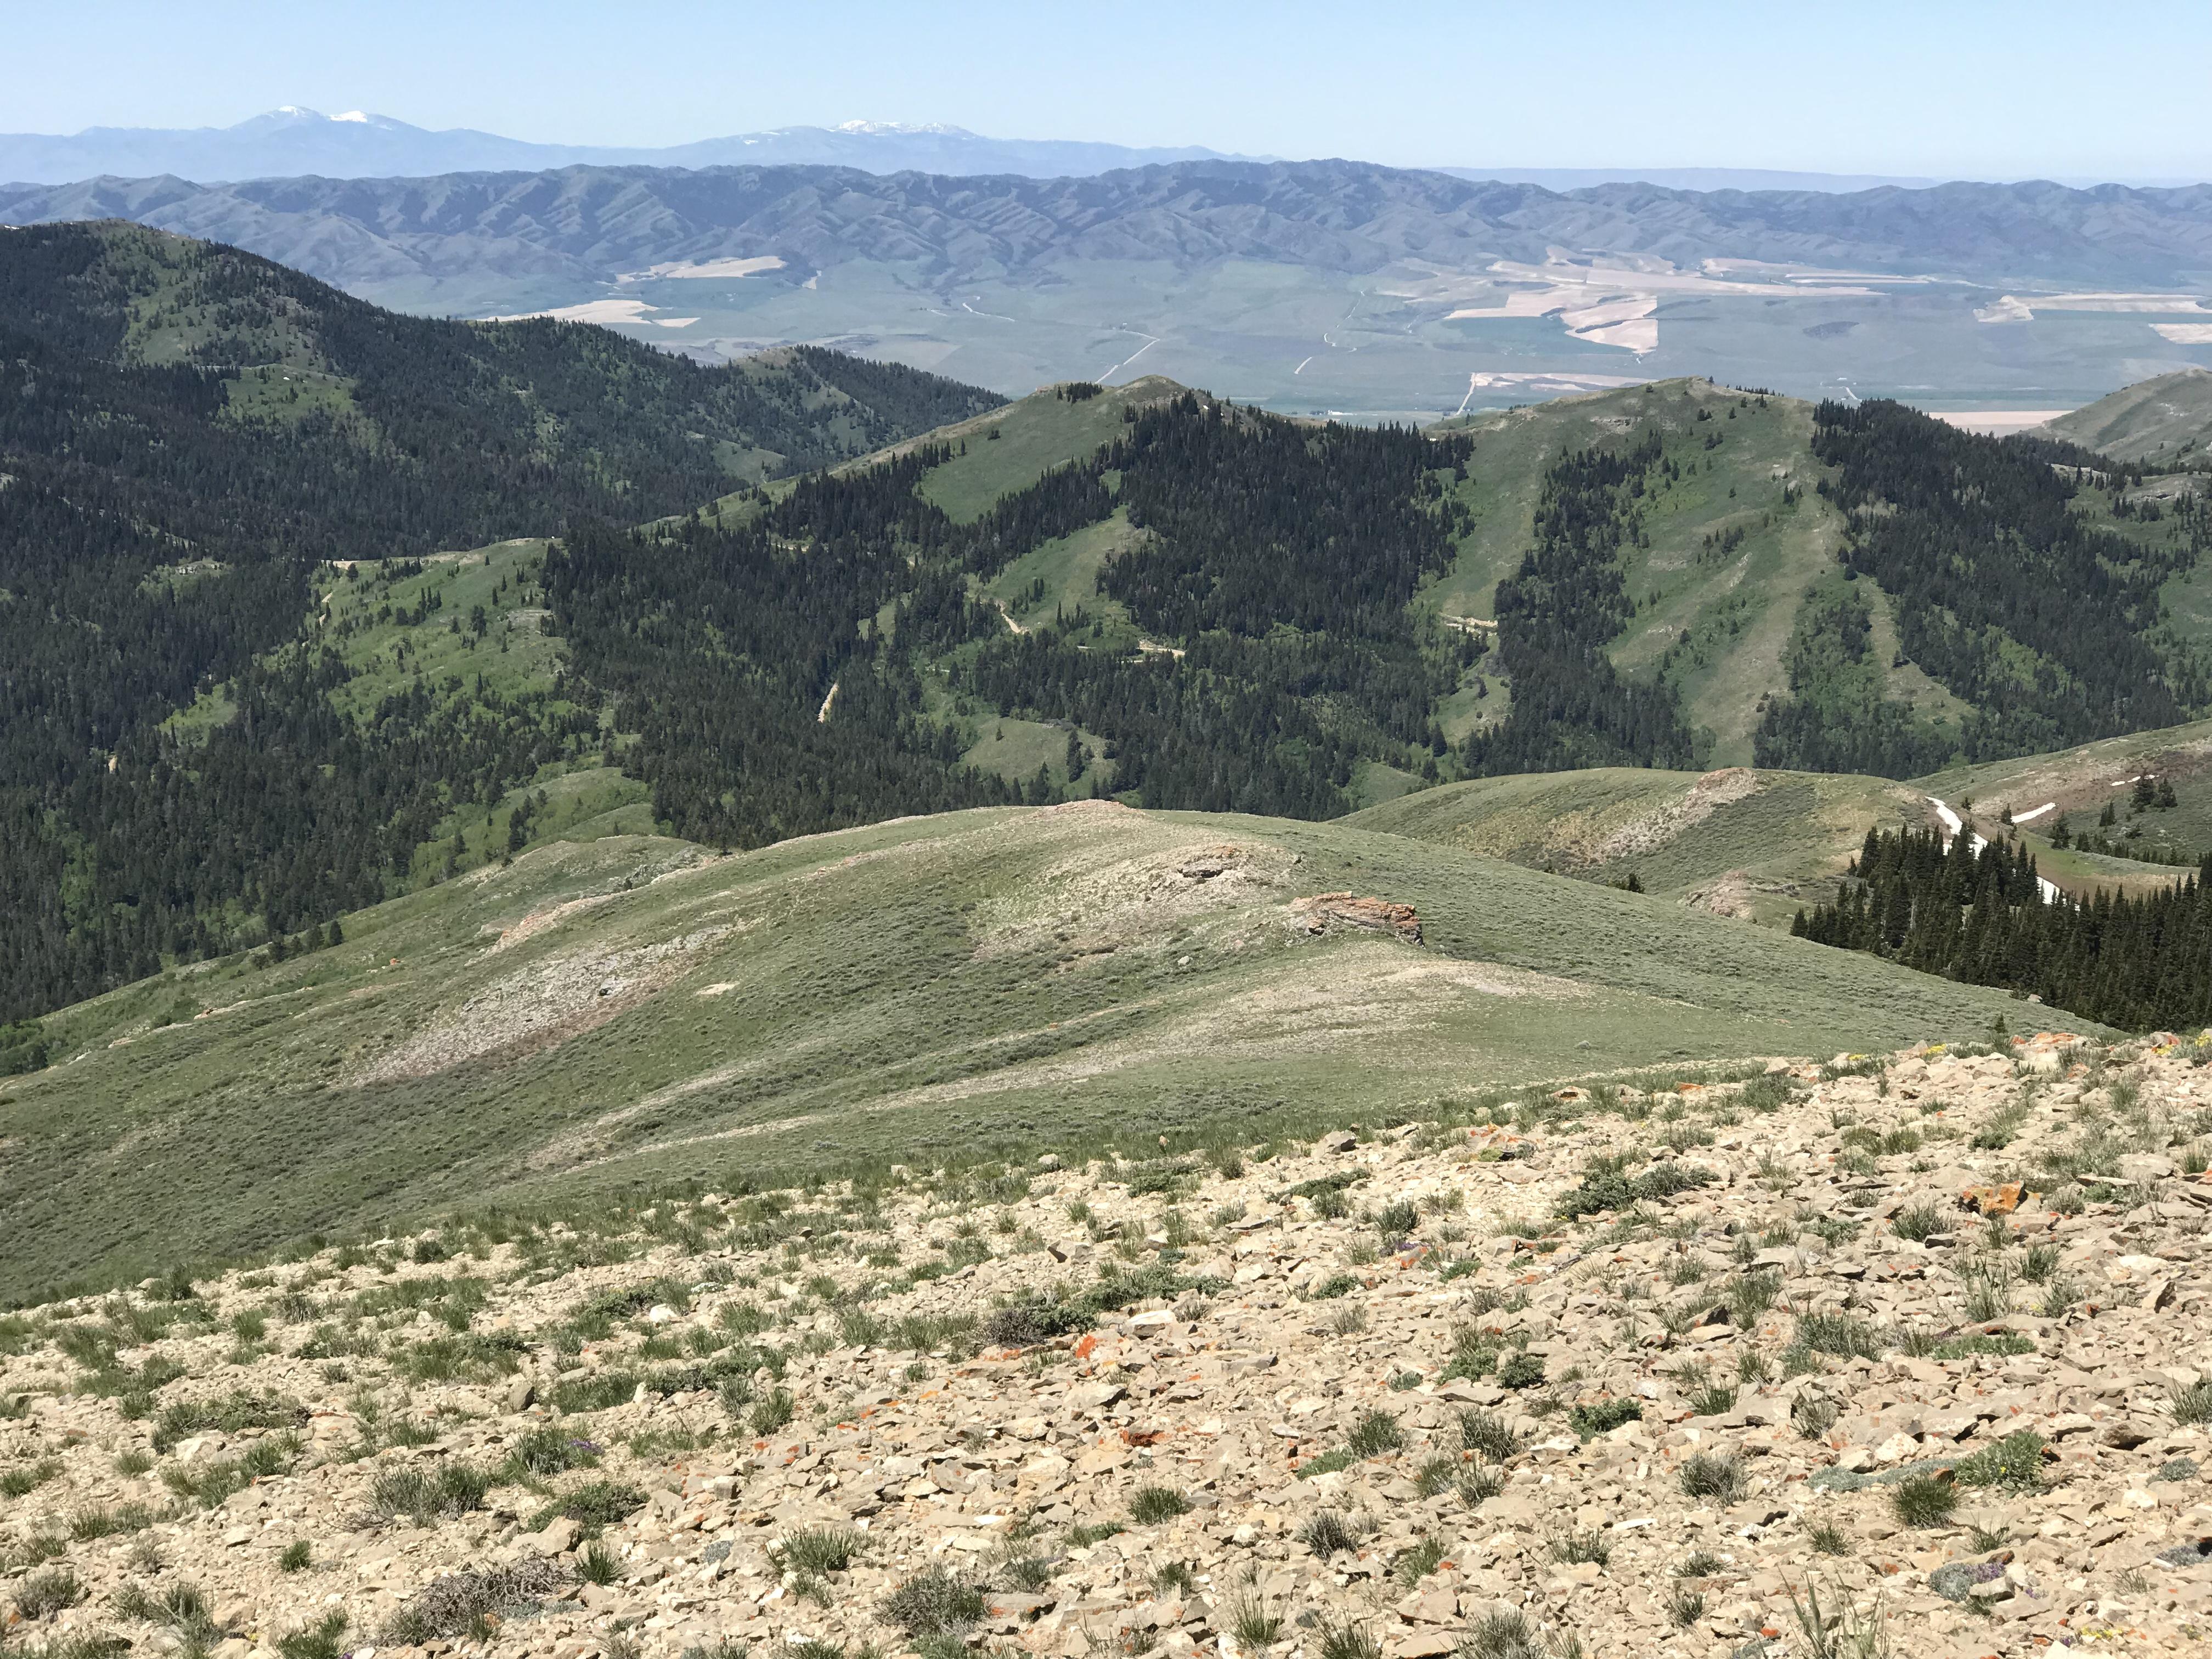 Looking,down the west ridge toward the Big Canyon/Knox Canyon pass.